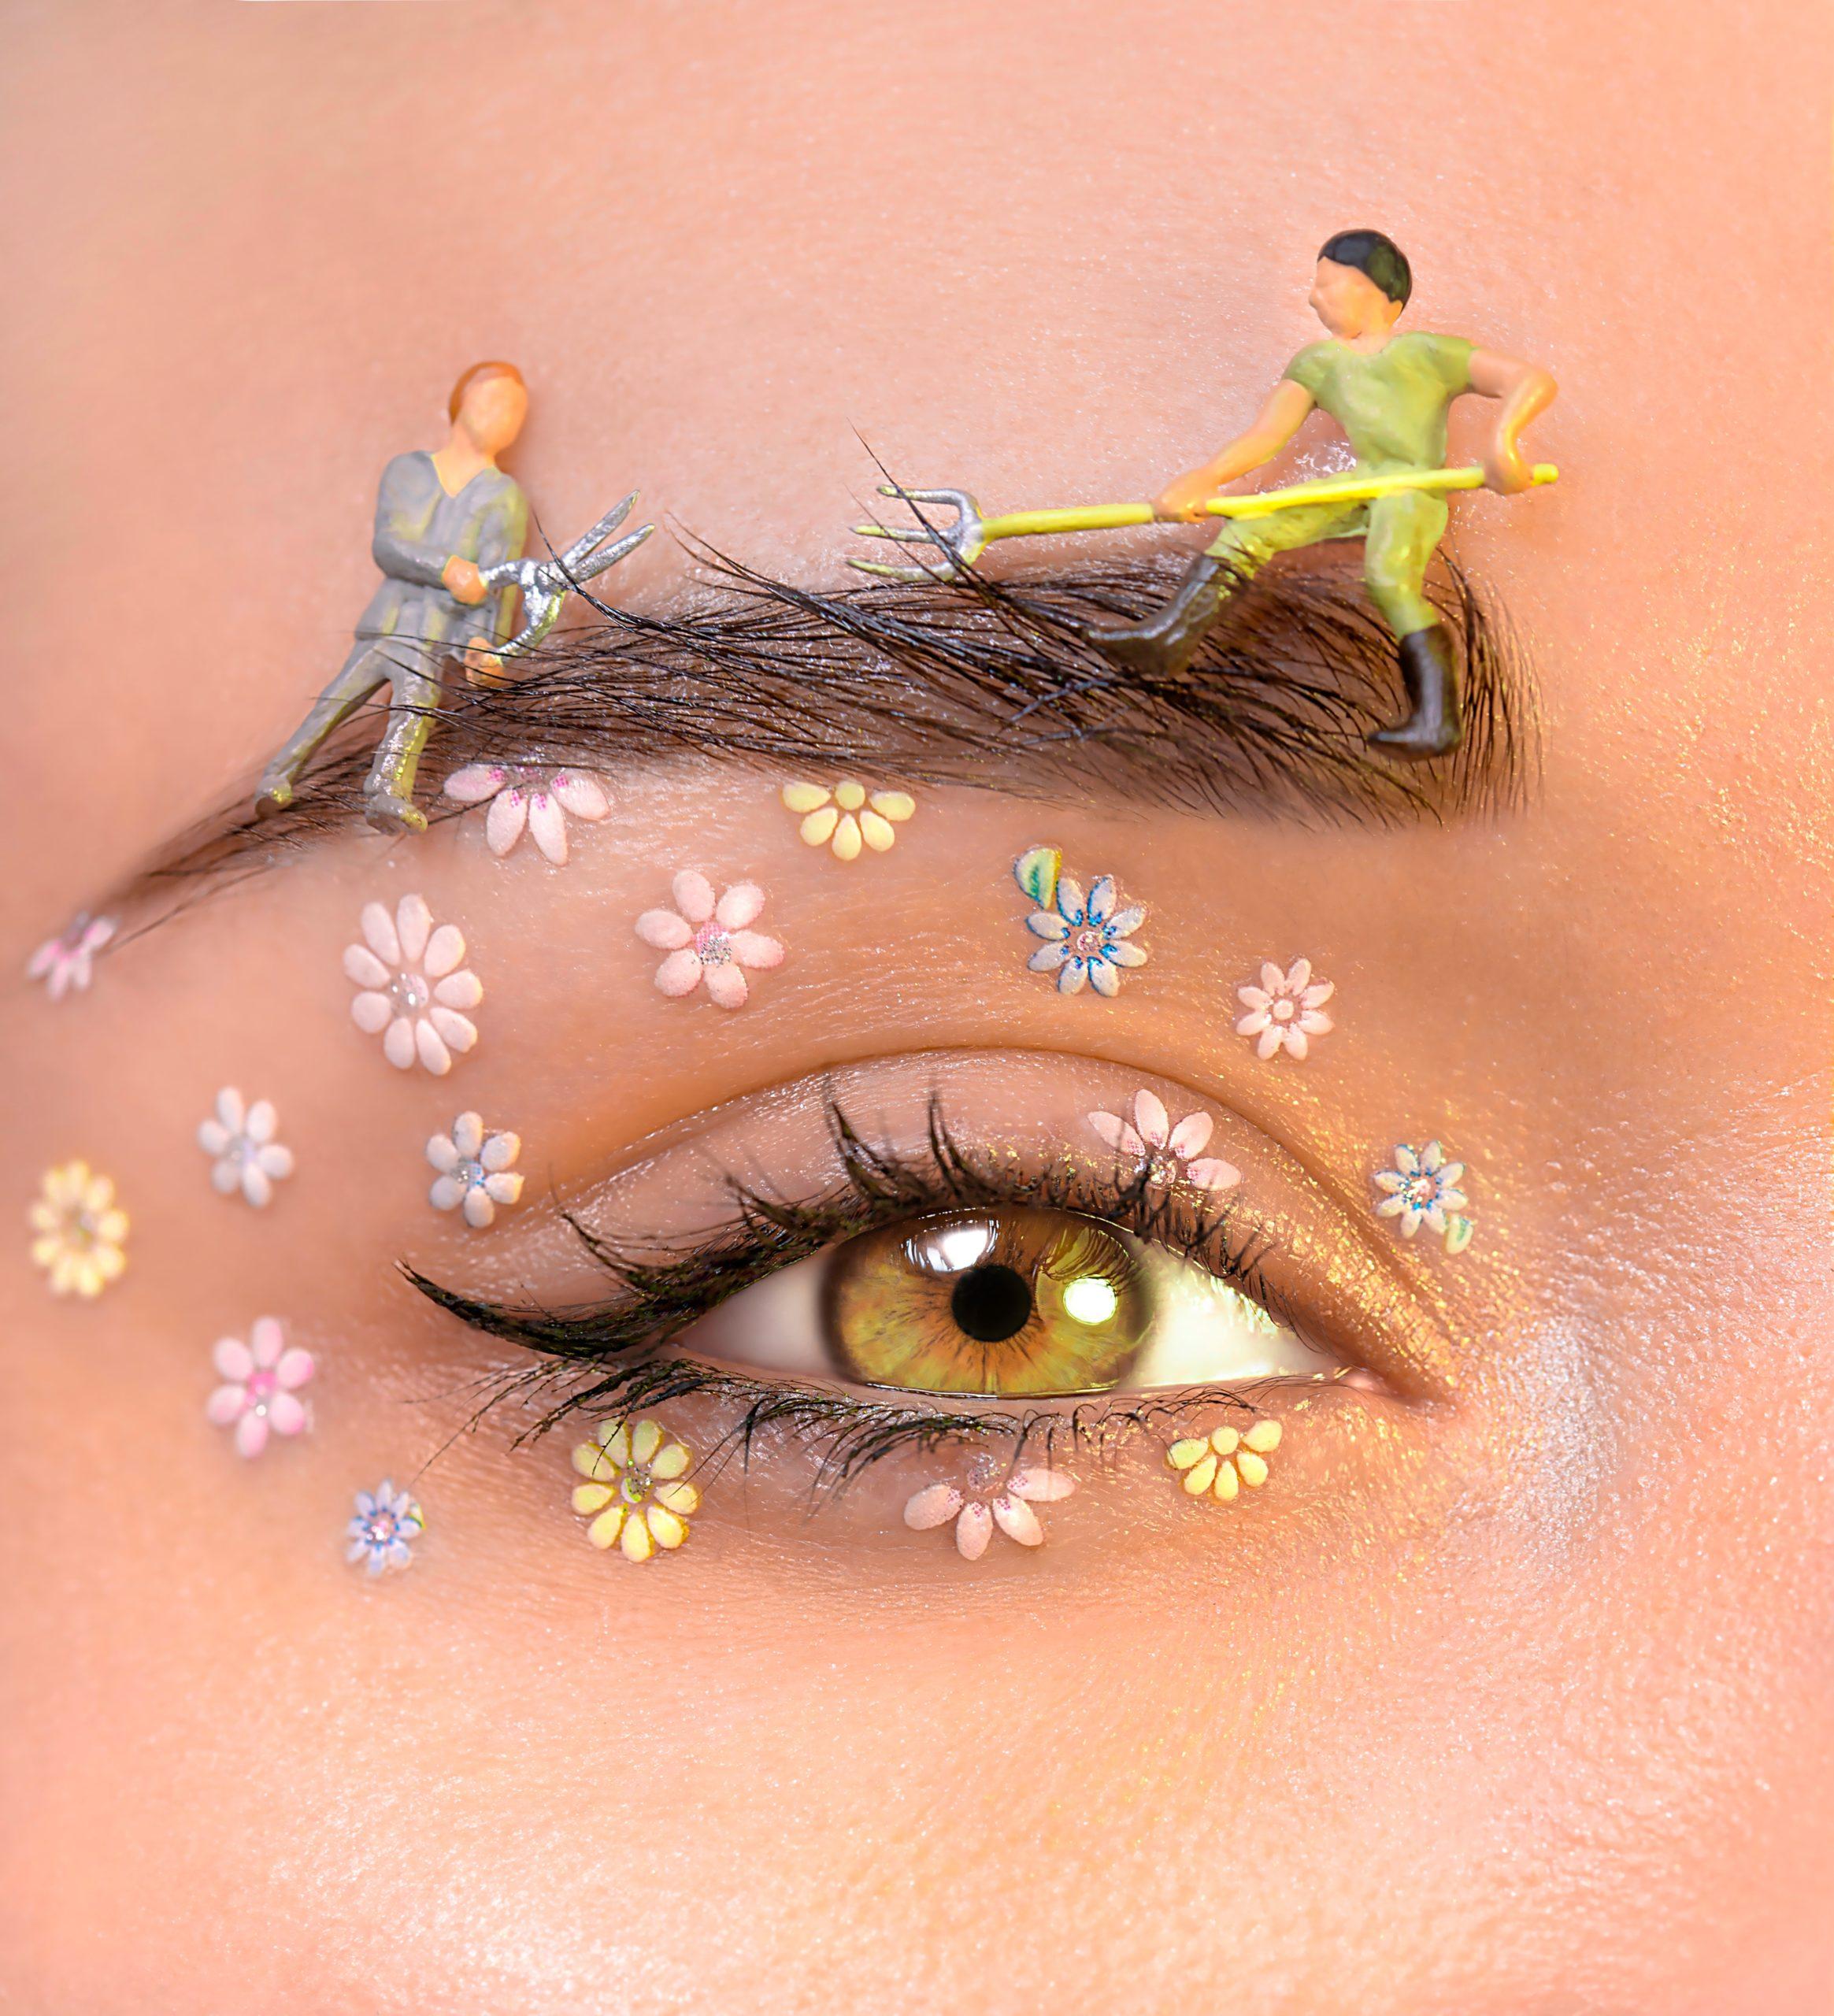 artistic-eye-makeup-3601536